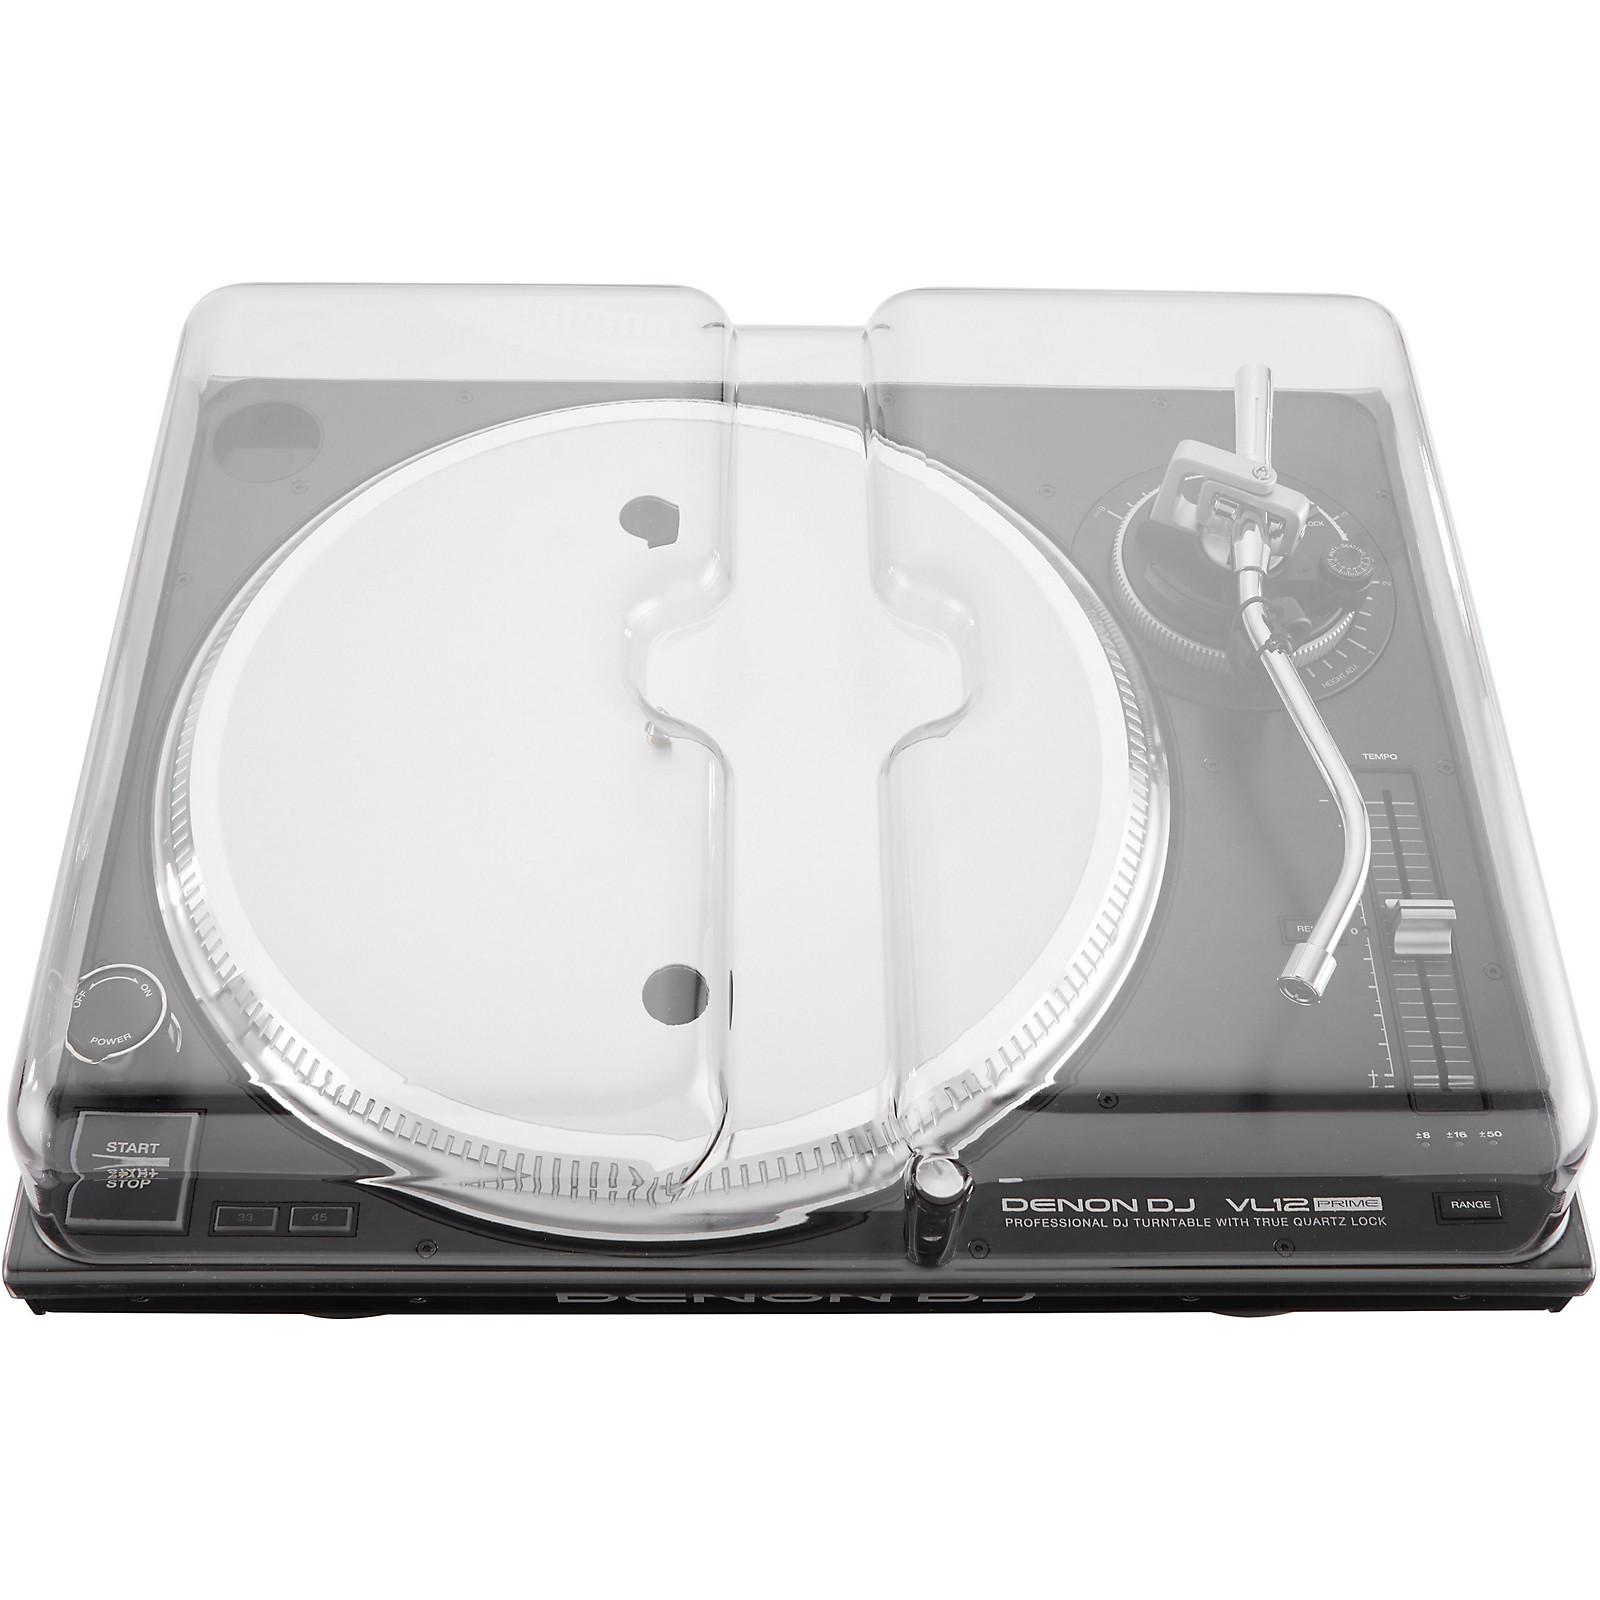 Decksaver Clear Polycarbonate Cover for Denon VL12 PRIME Professional Turntable